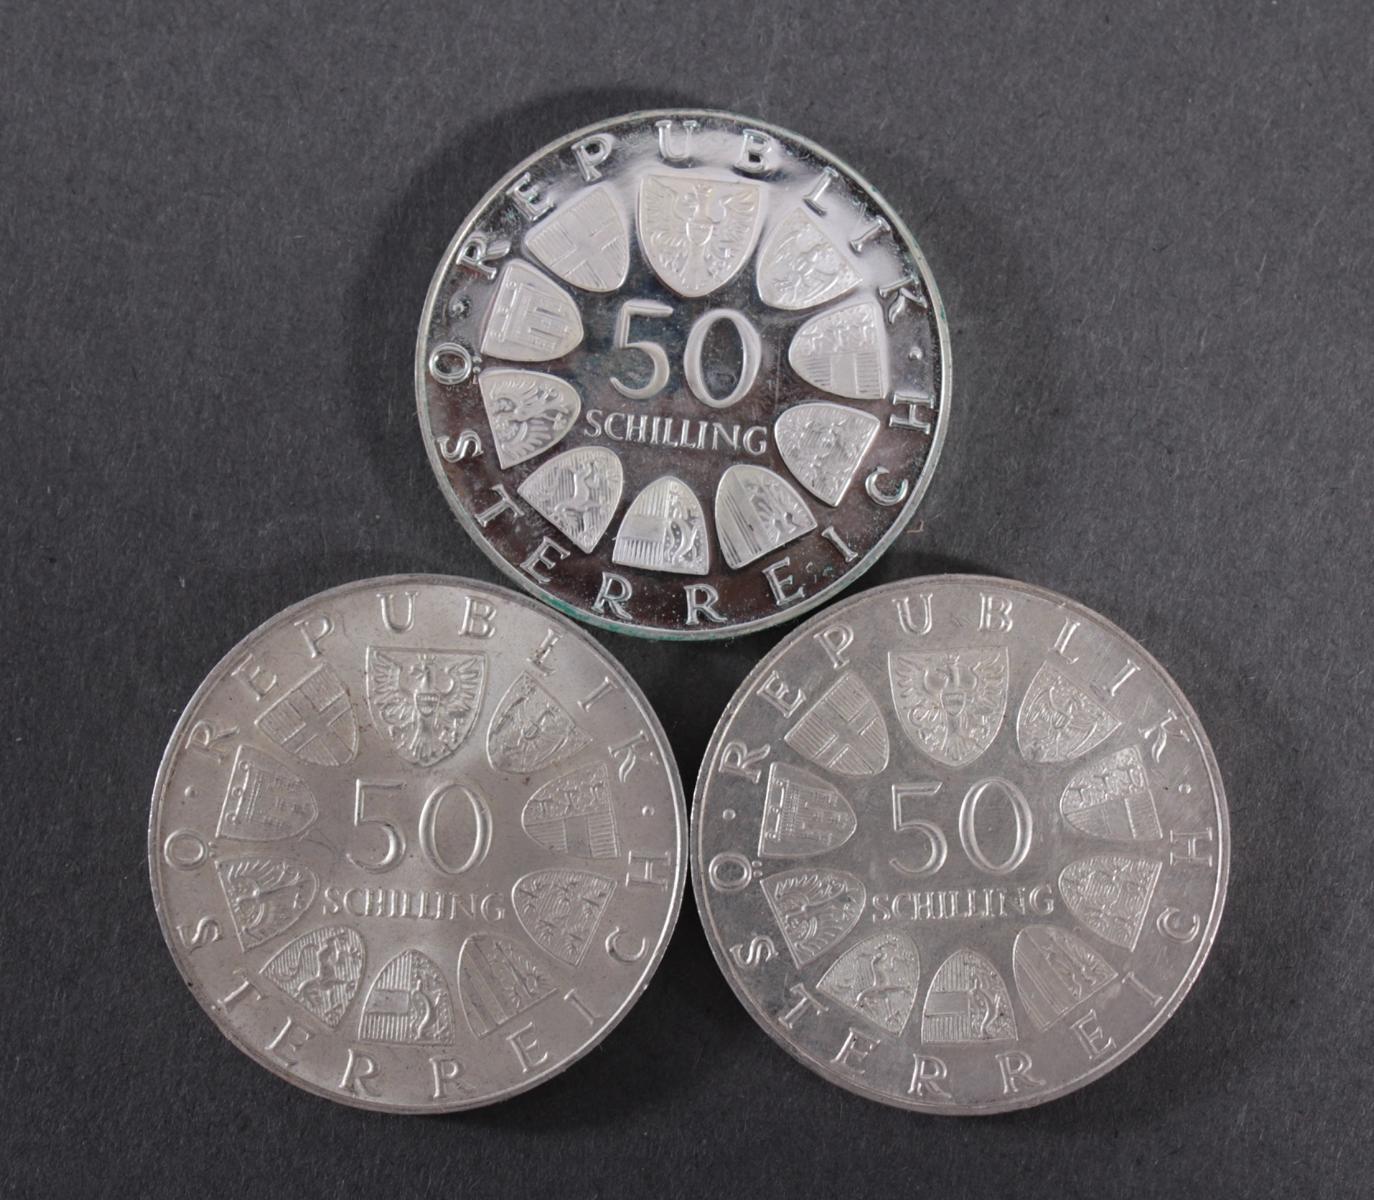 50 Schilling Silbermünzen – 3 Stück-2